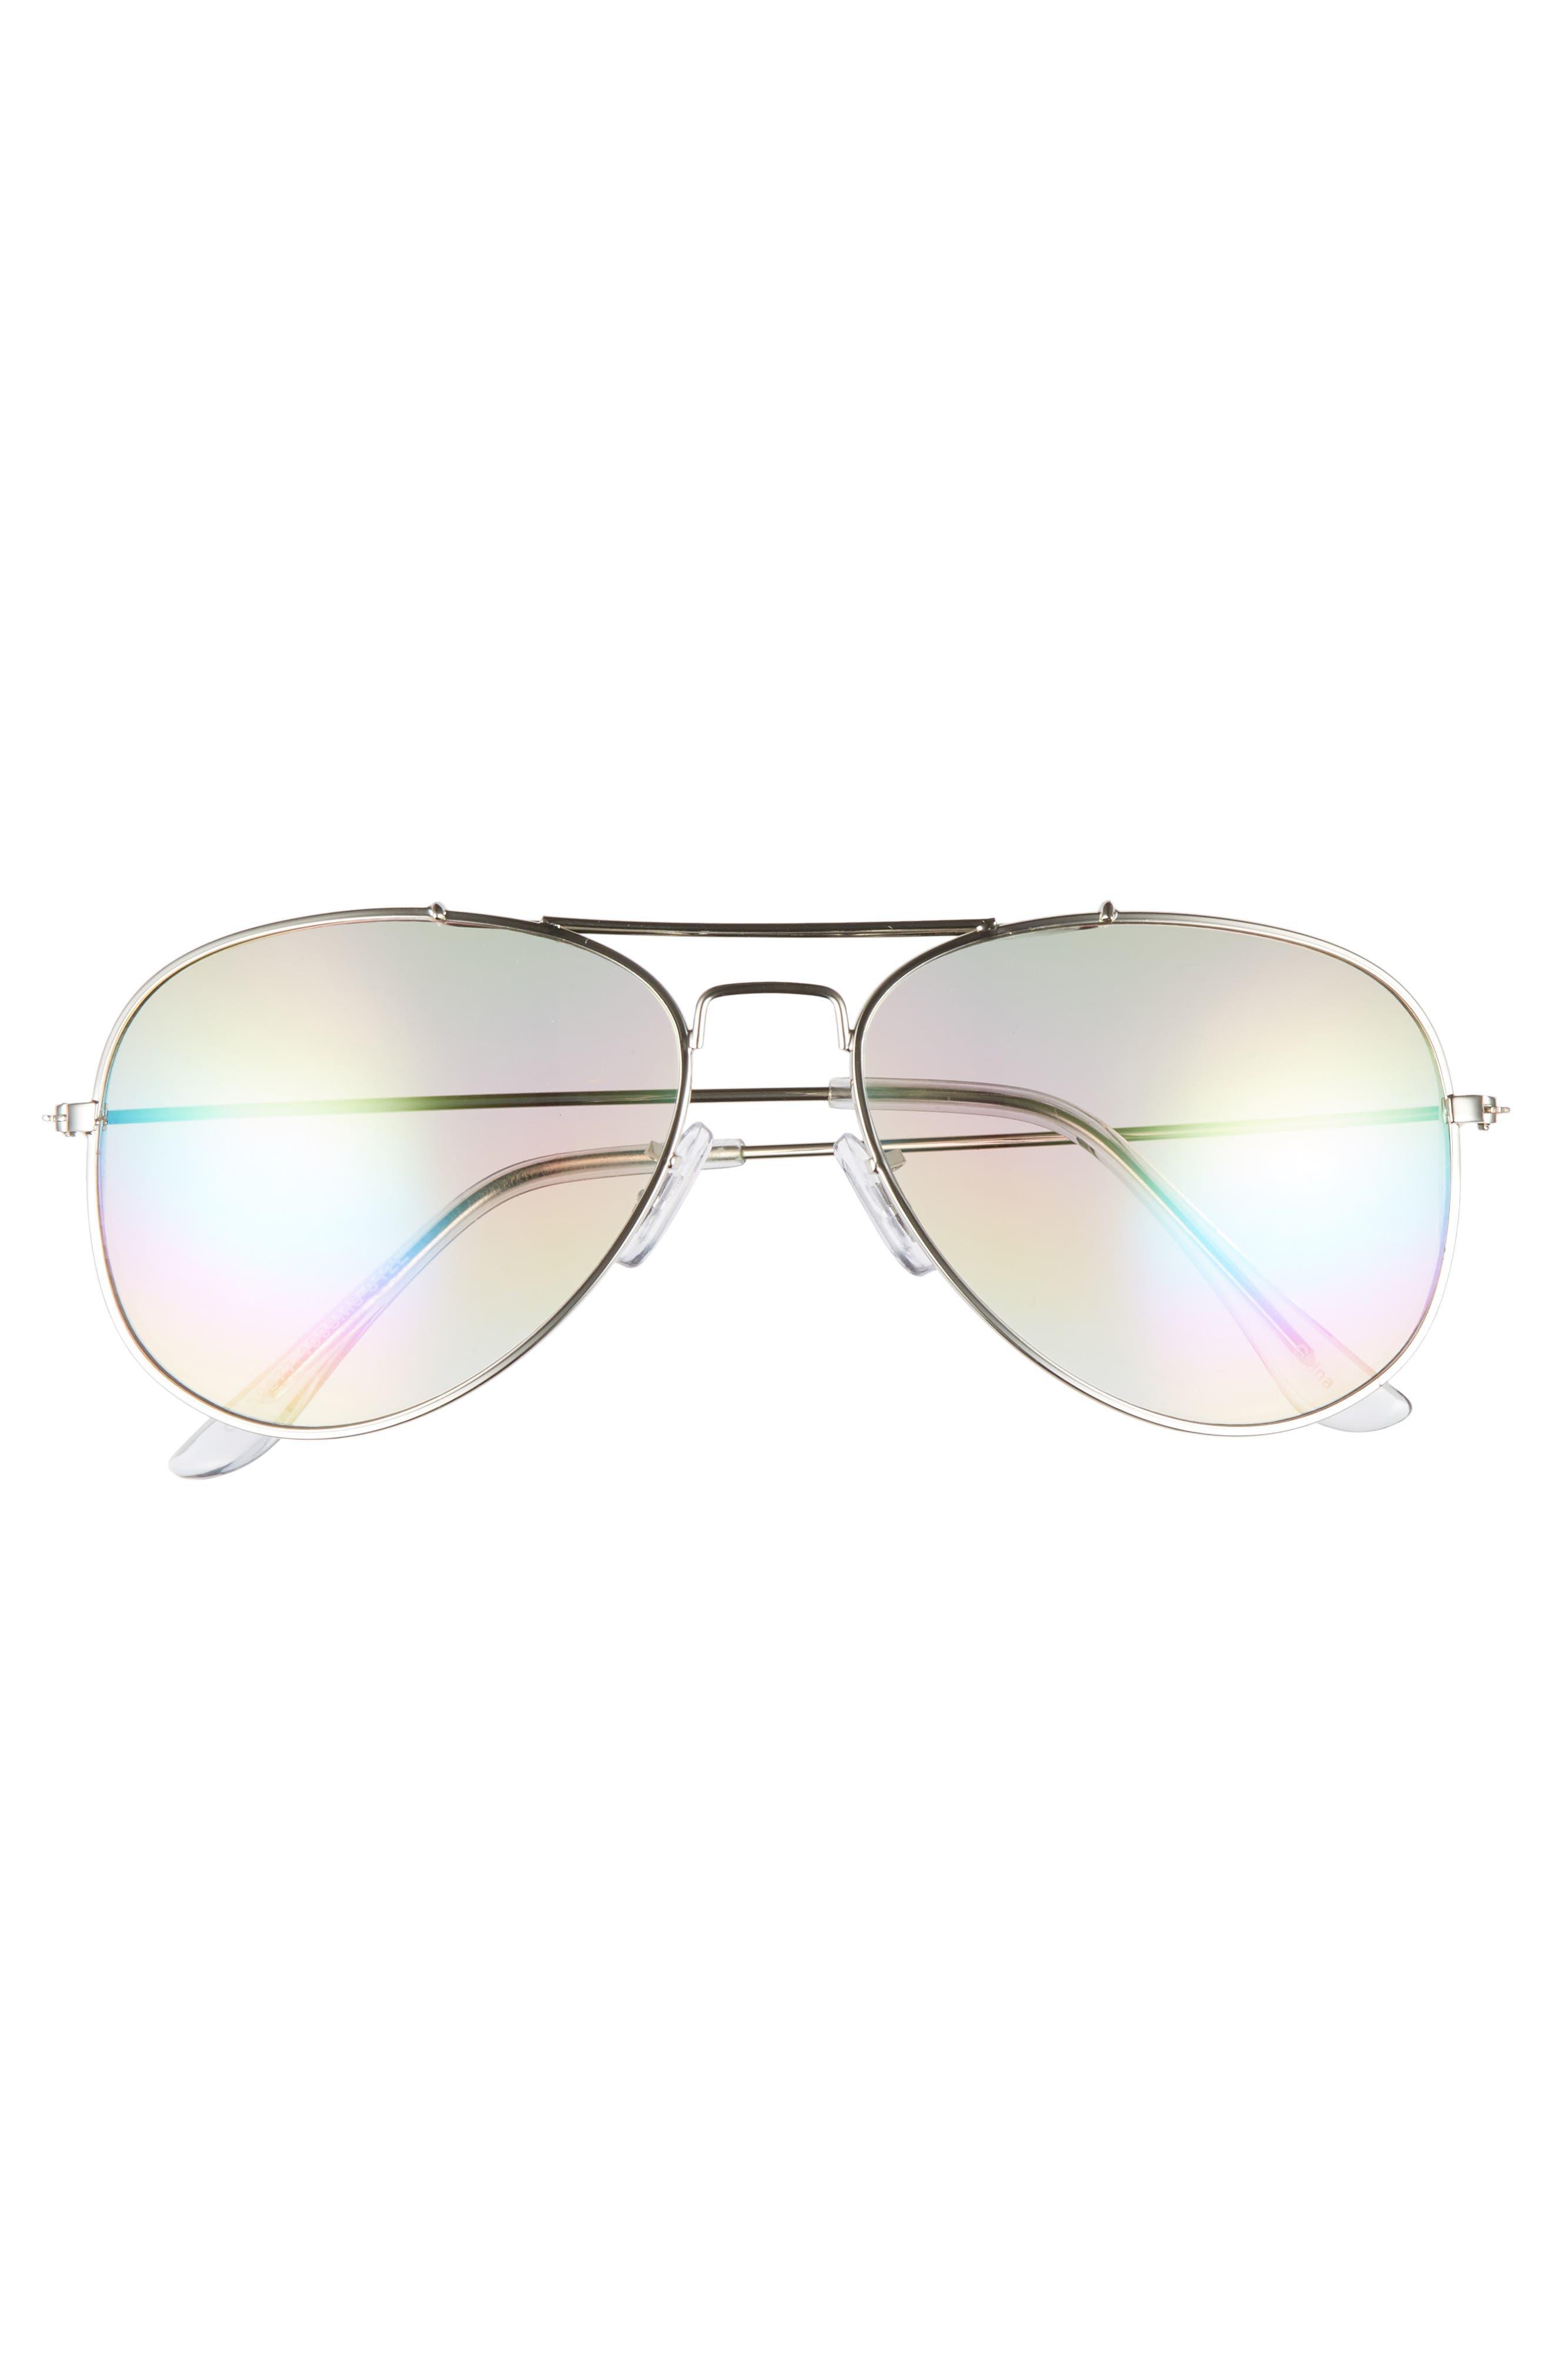 Rainbow Aviator Sunglasses,                             Alternate thumbnail 3, color,                             040